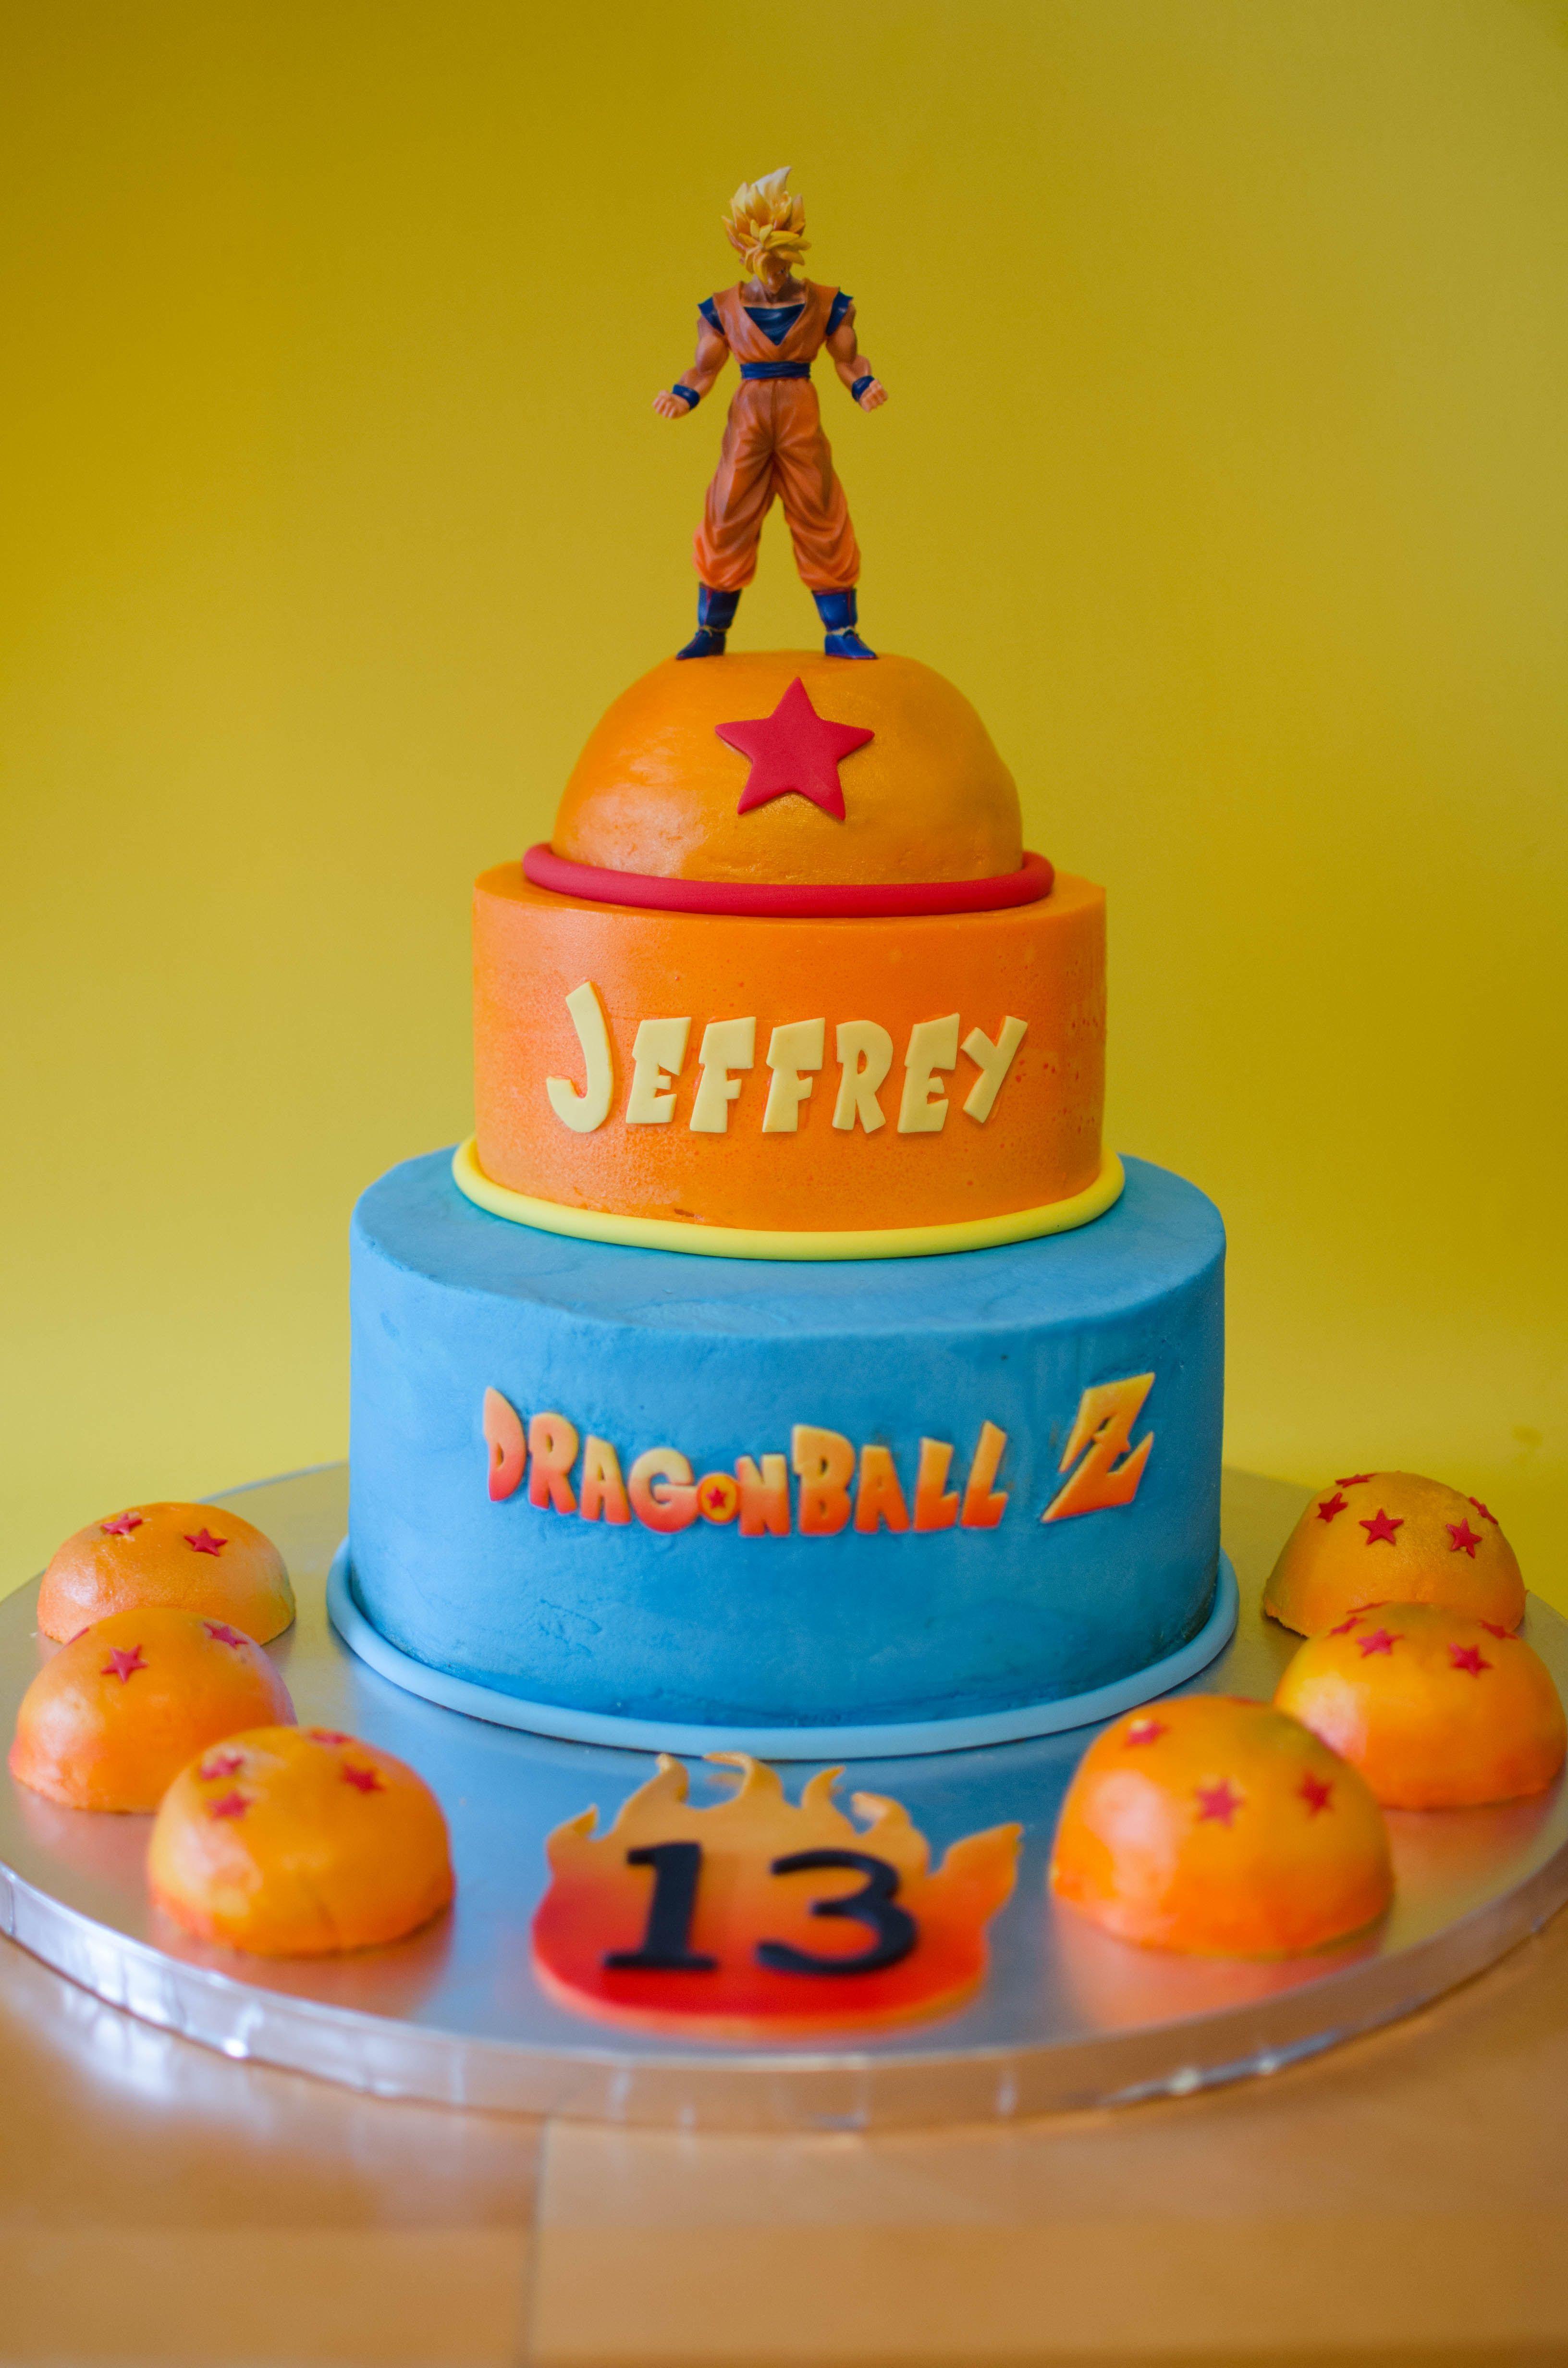 Dragon Ball Z Cake Decorations Dragon Ball Birthday Party Supplies  Google Search  Cakes